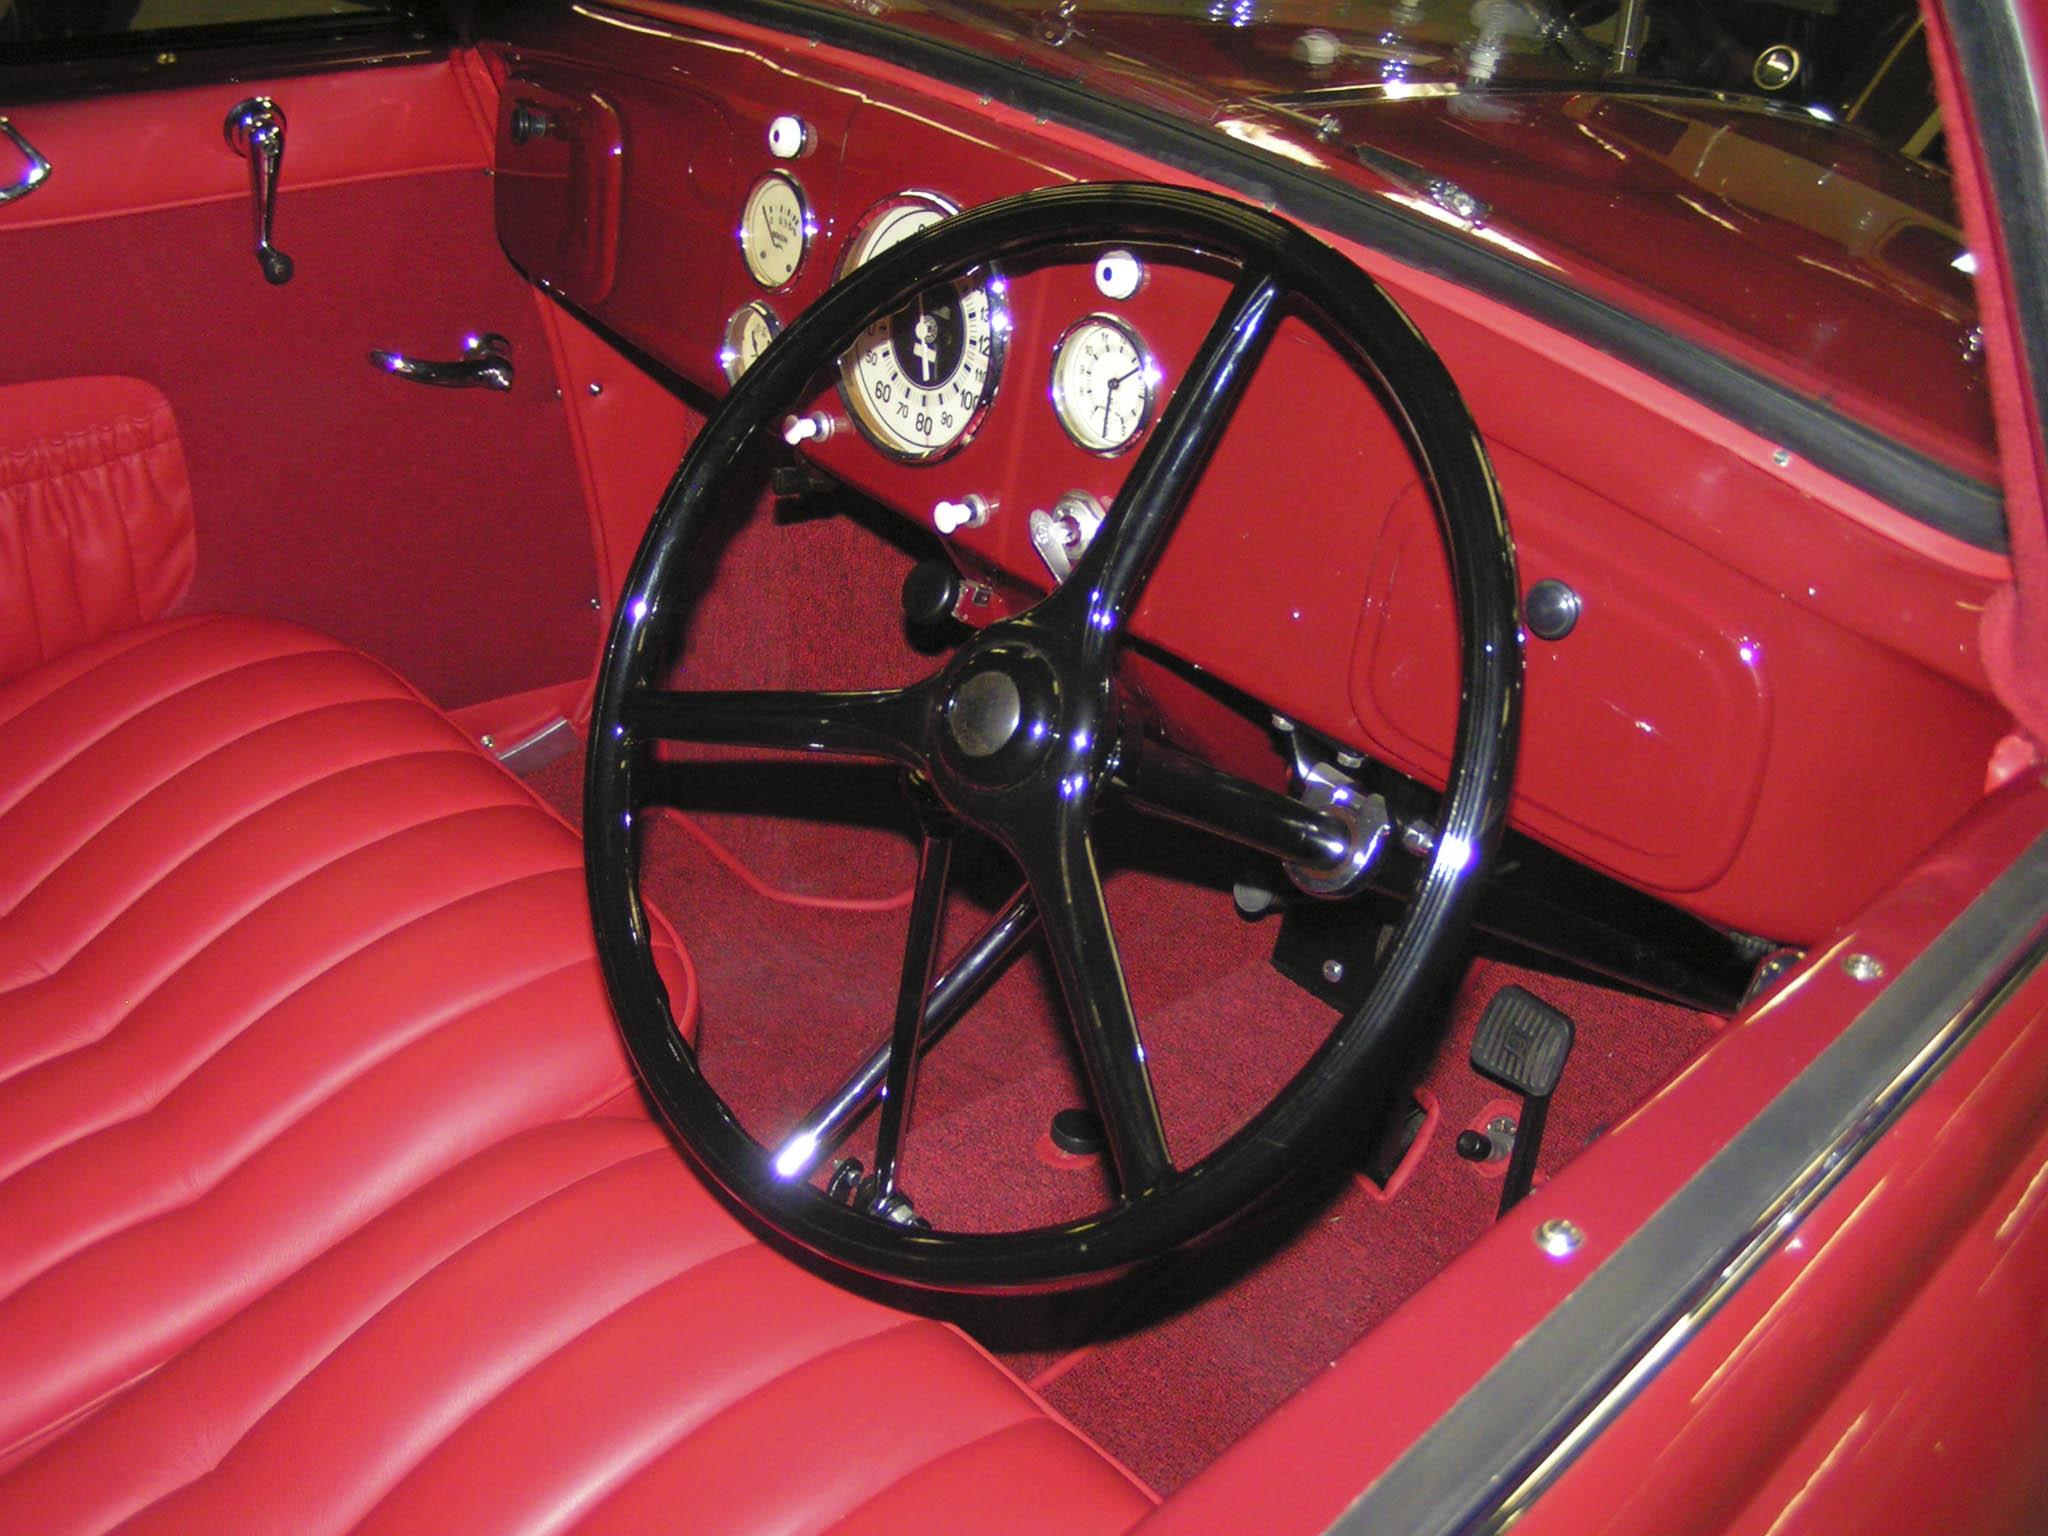 tatra 97 engine diagram wiring diagrams lose Tatra Cars Tatra 97 Engine Diagram #1